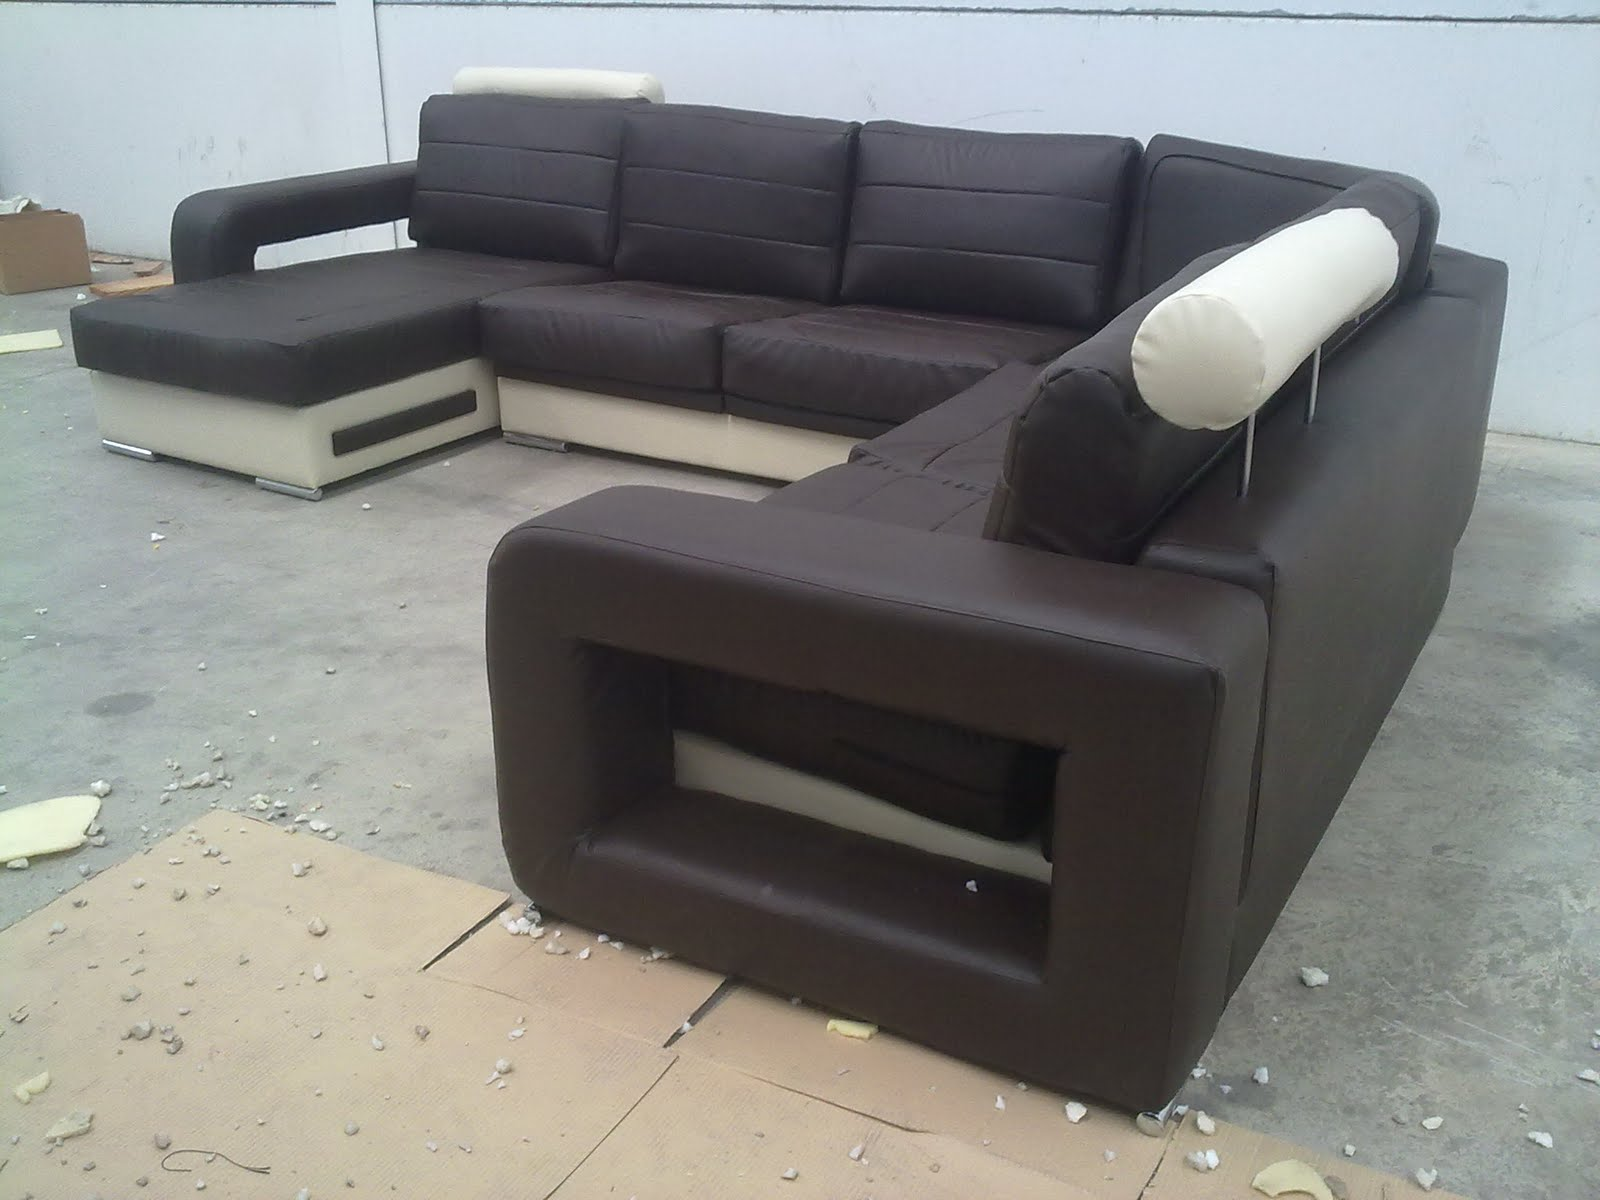 sofas chaise longue baratos madrid black modern sofa table fabricantes de en los